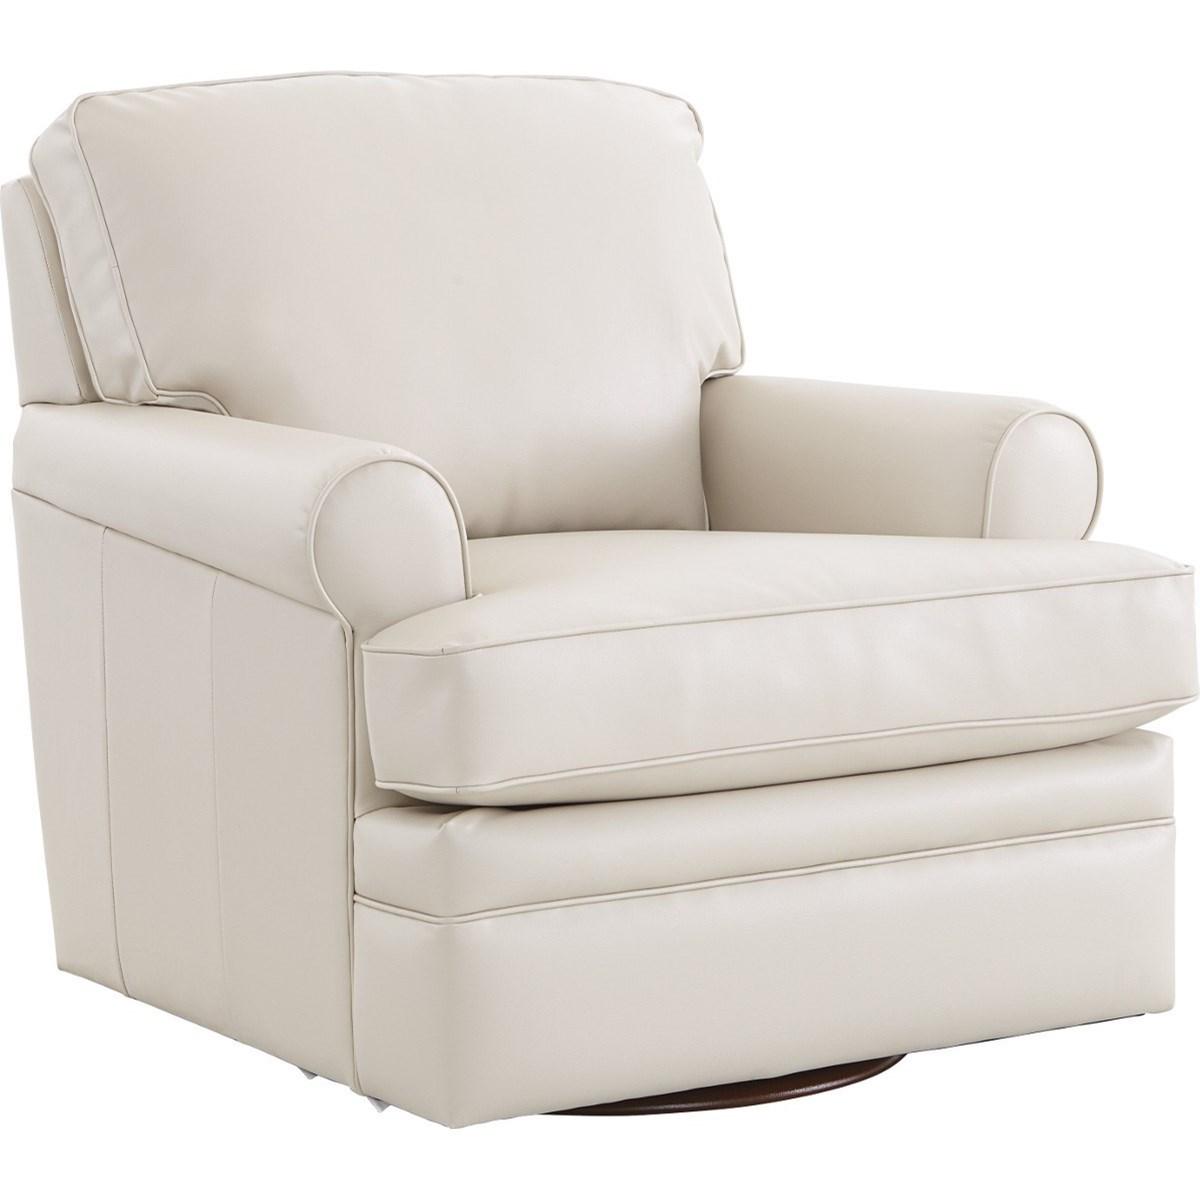 Chairs Premier Swivel Glider by La-Z-Boy at Jordan's Home Furnishings